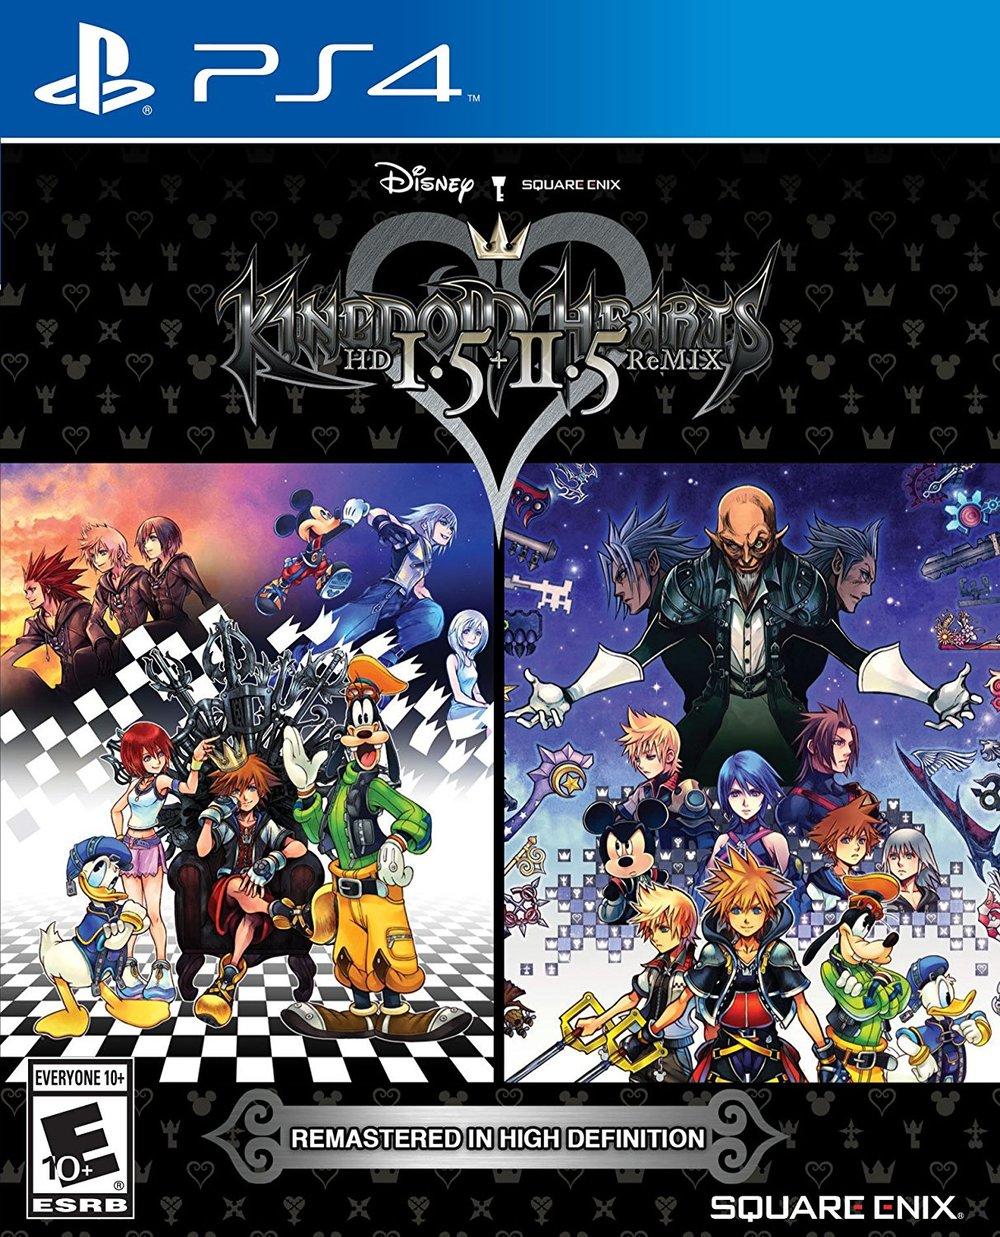 Image courtesy Square Enix and Disney